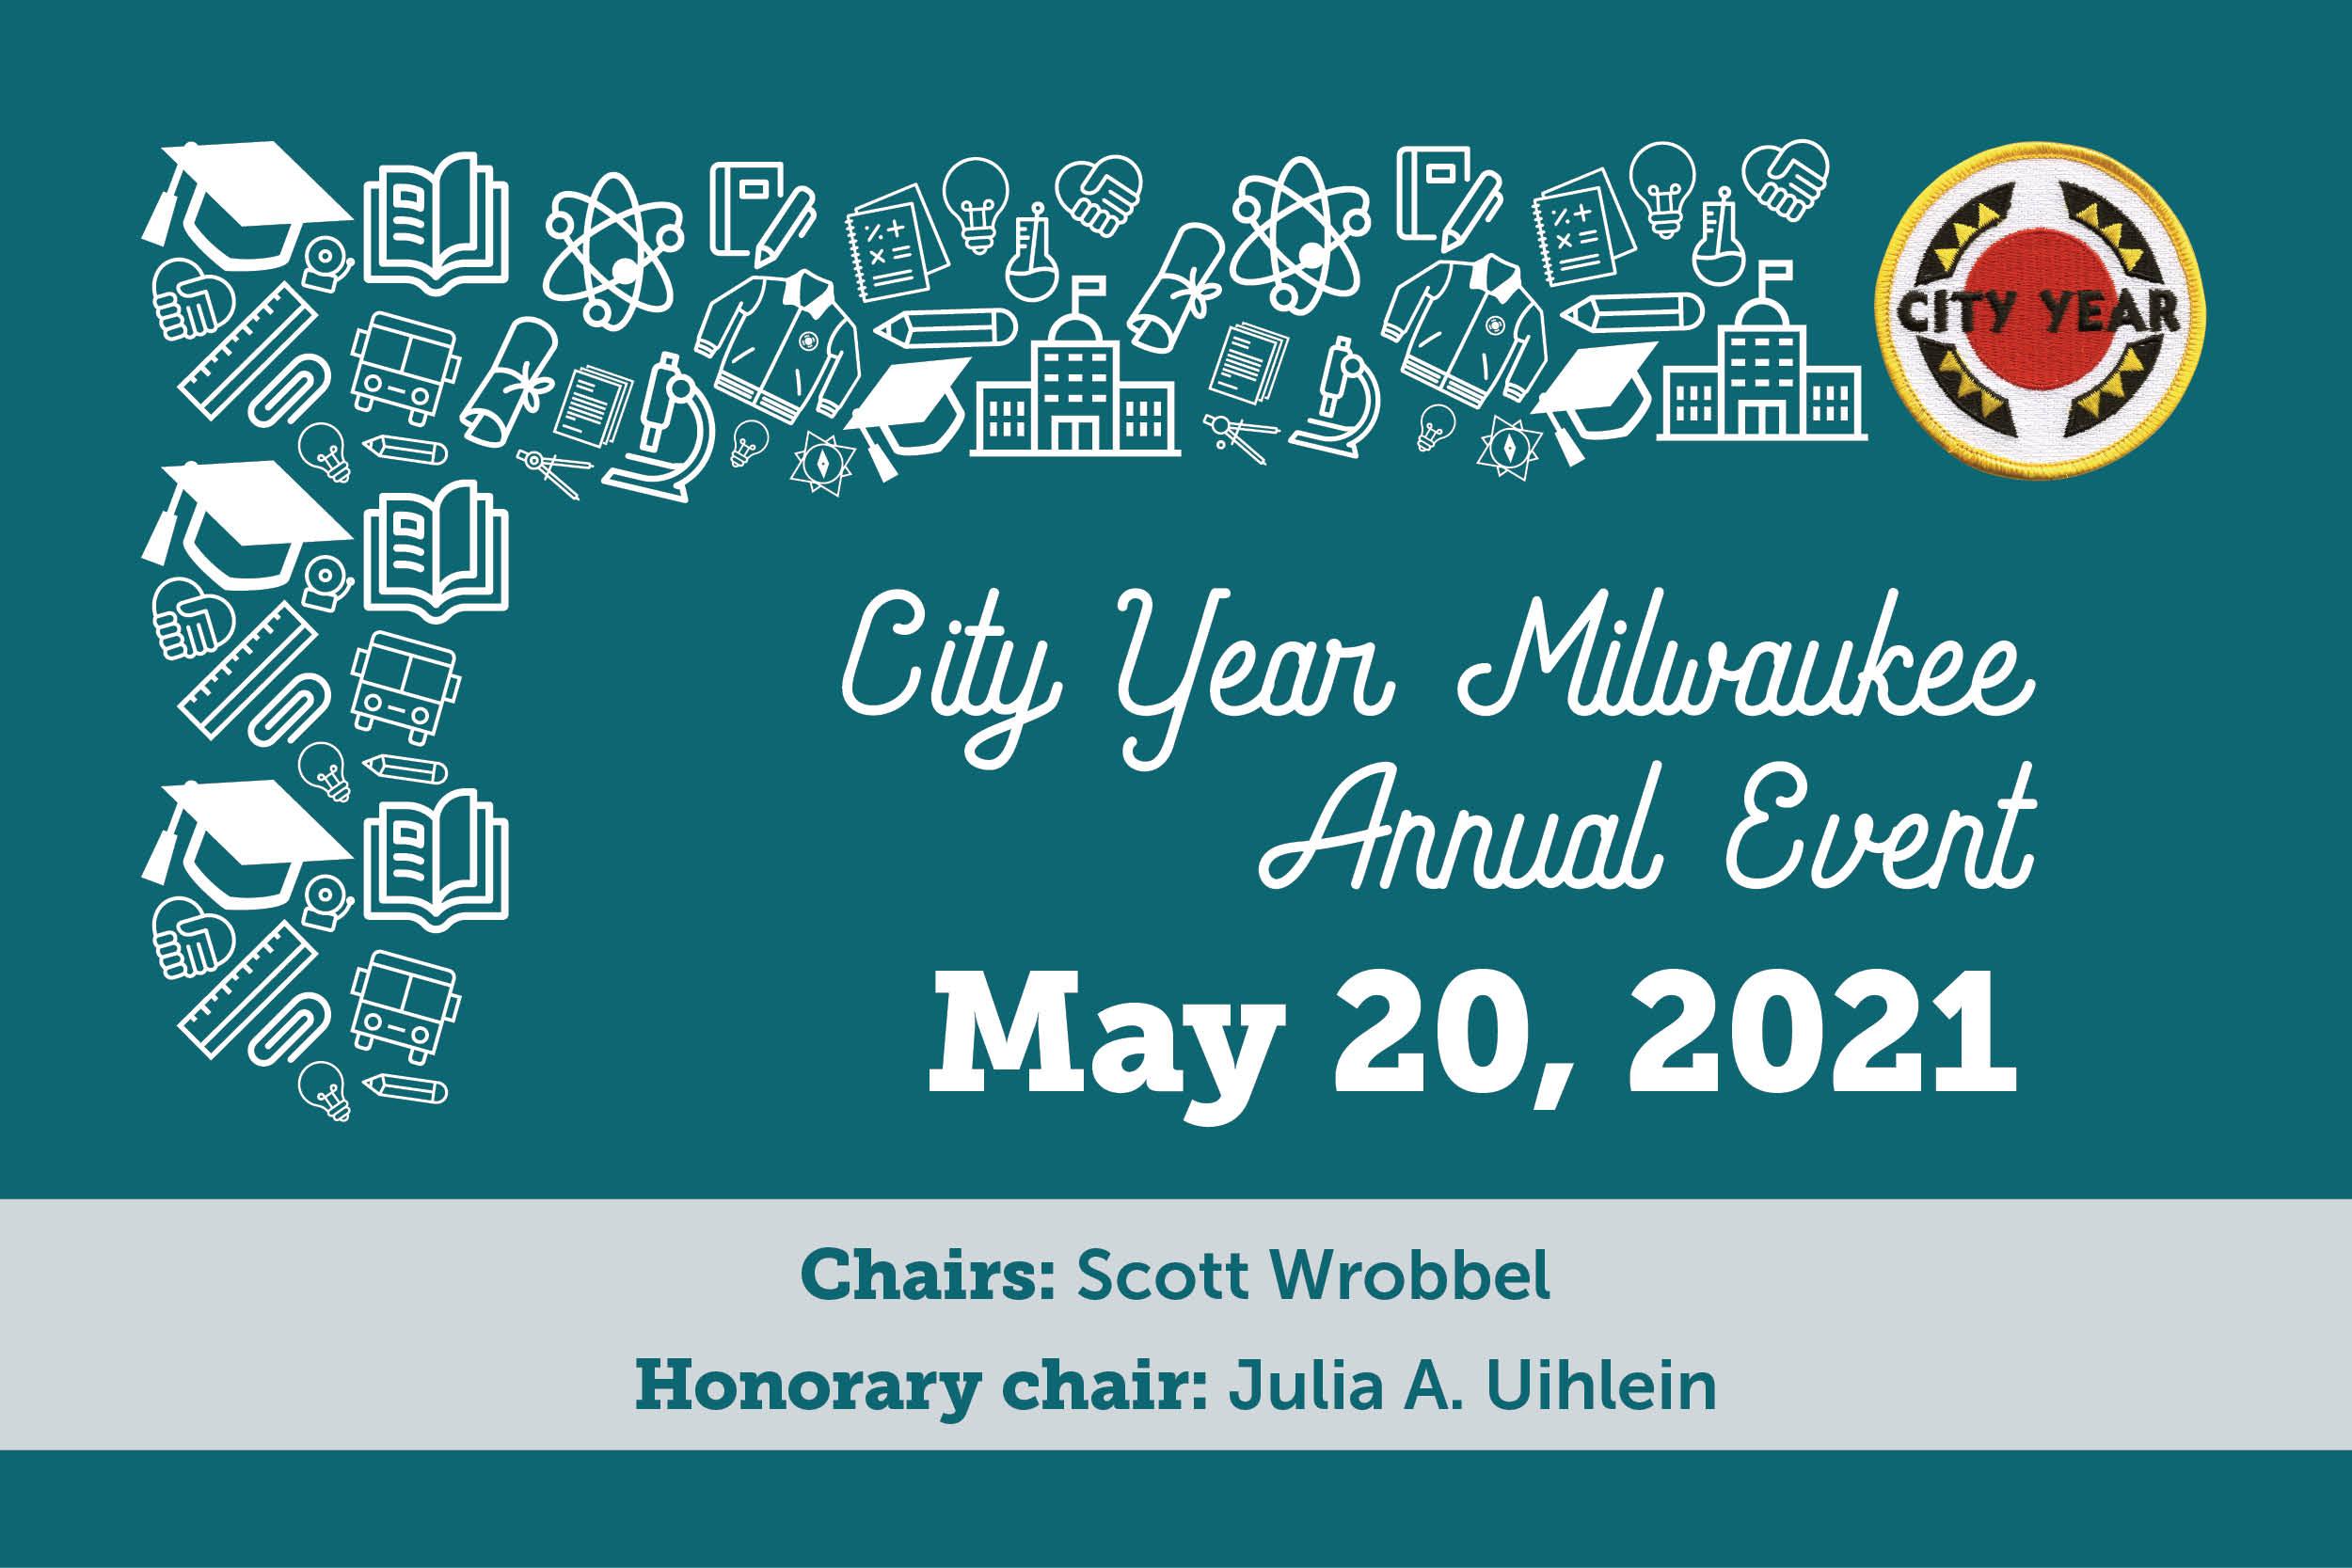 City Year Milwaukee Annual Event